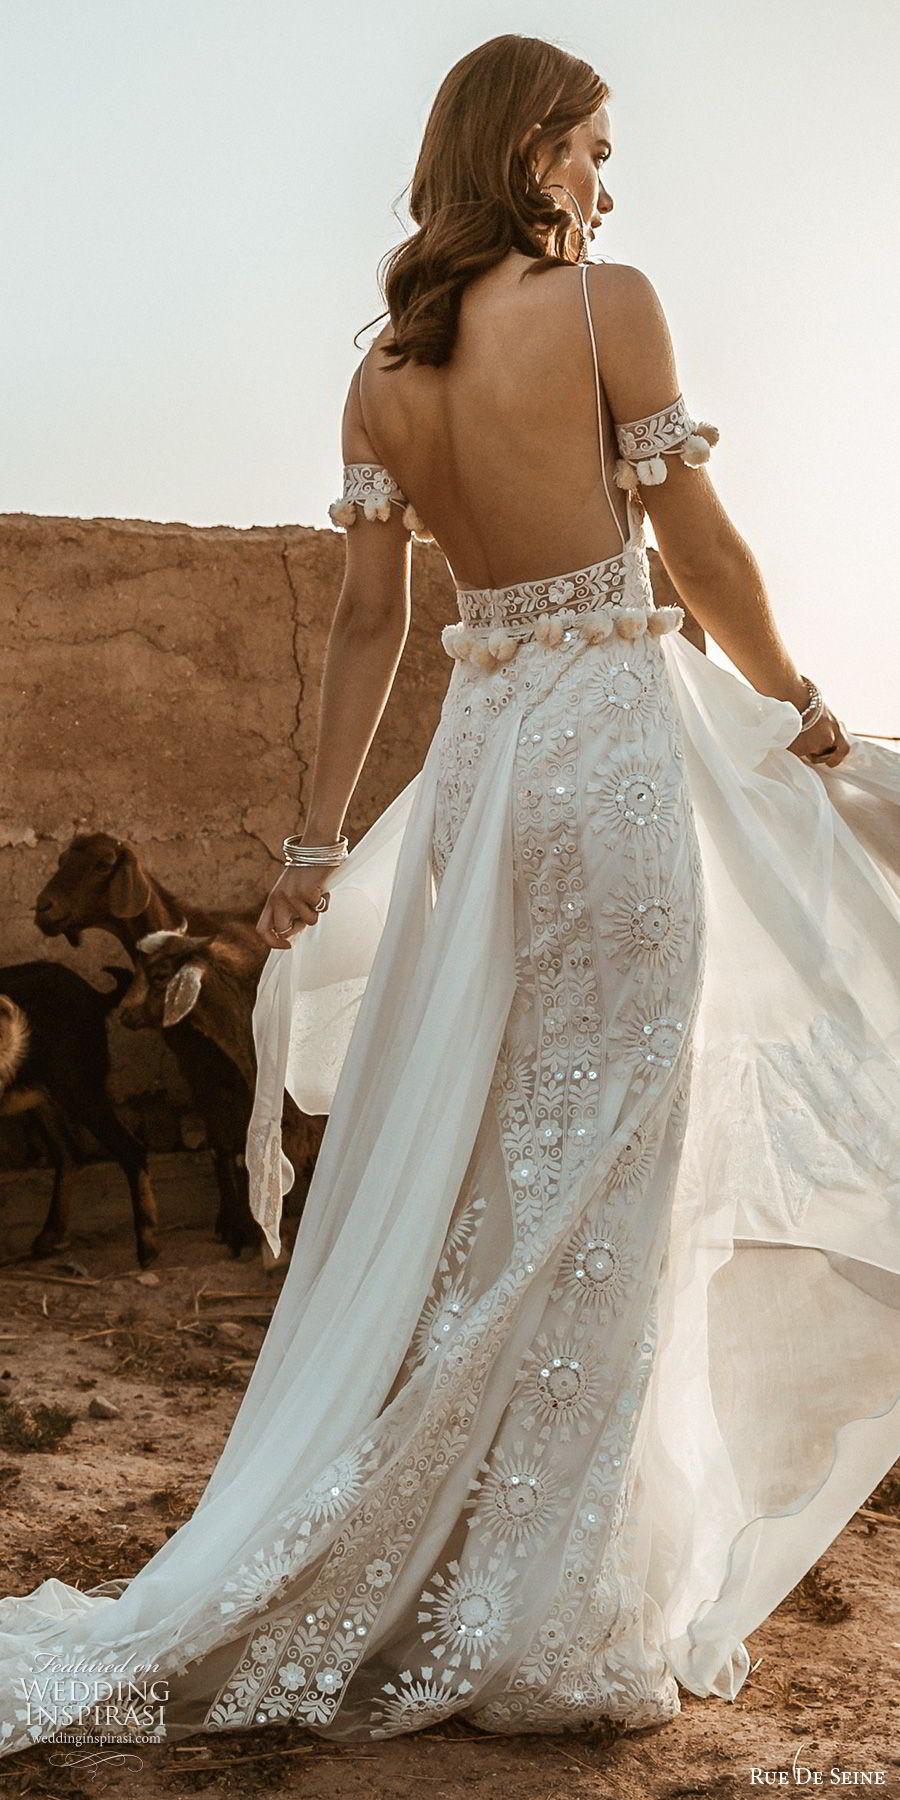 rue de seine 2019 bridal sleeveless thin straps deep sweetheart fully embellished lace modified a line sheath wedding dress (10) boho chic romantic chapel train bv